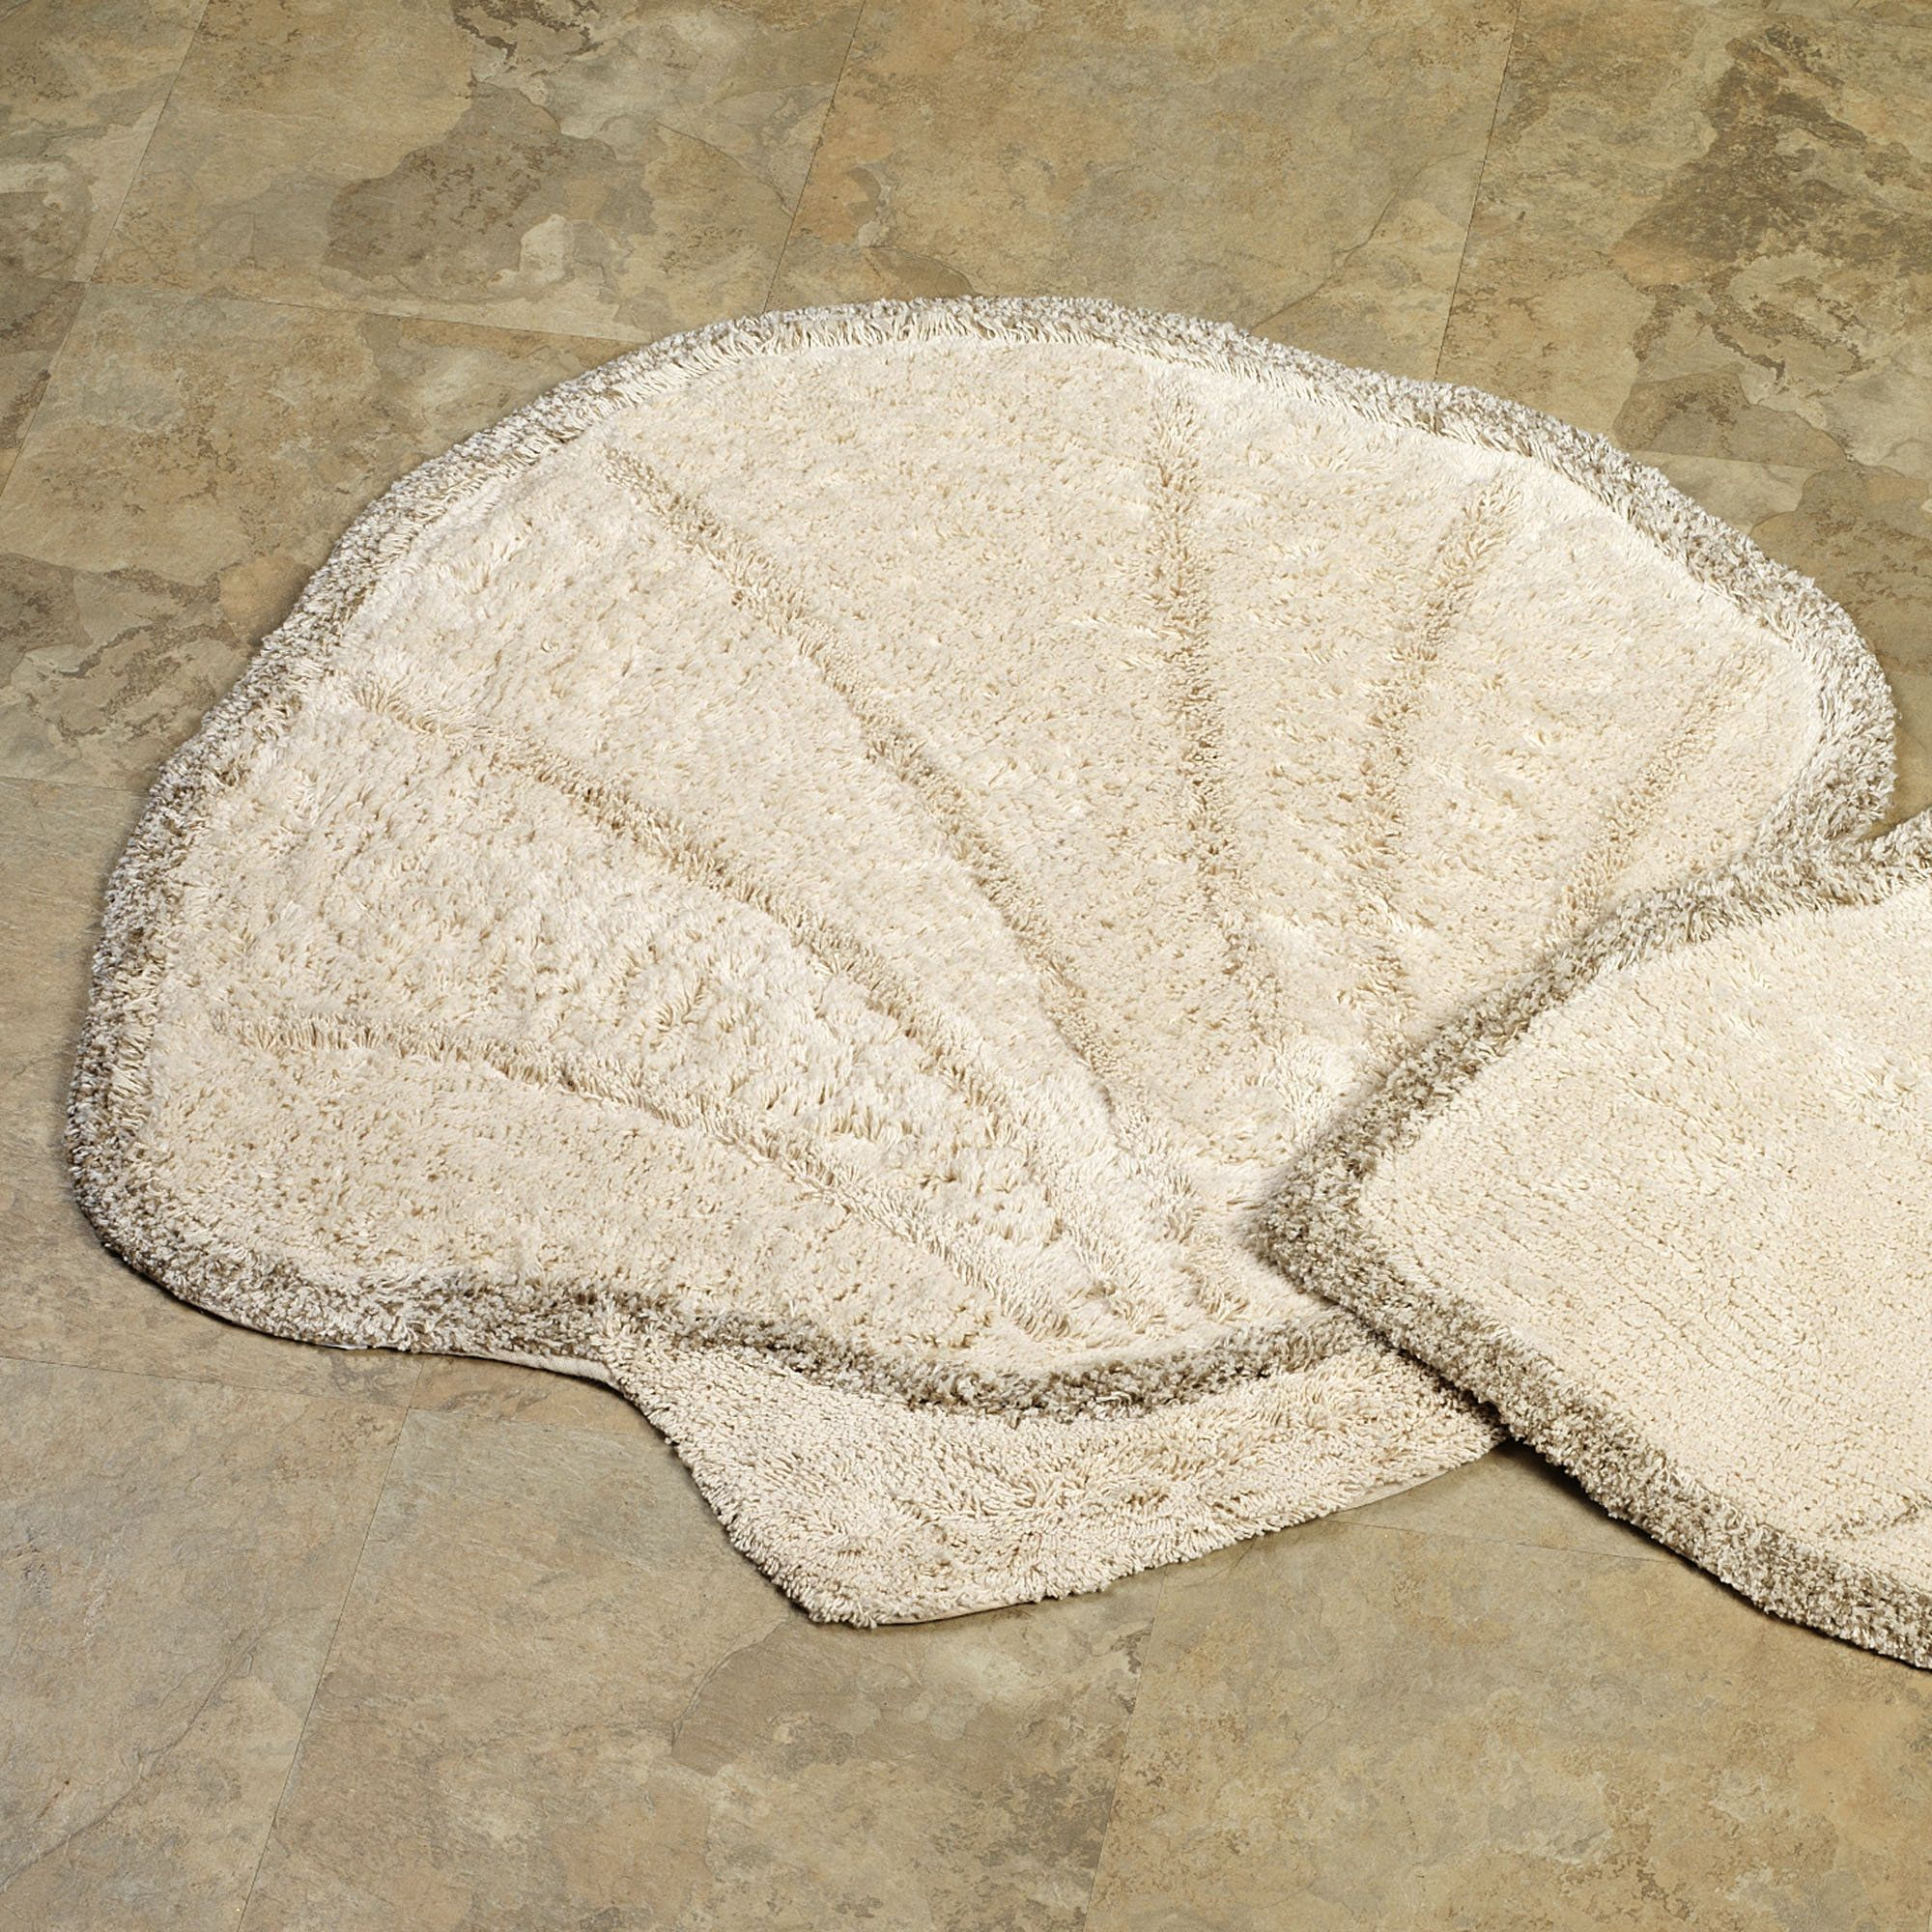 scallop shell bath rug | scallop shells, bath rugs and seashell